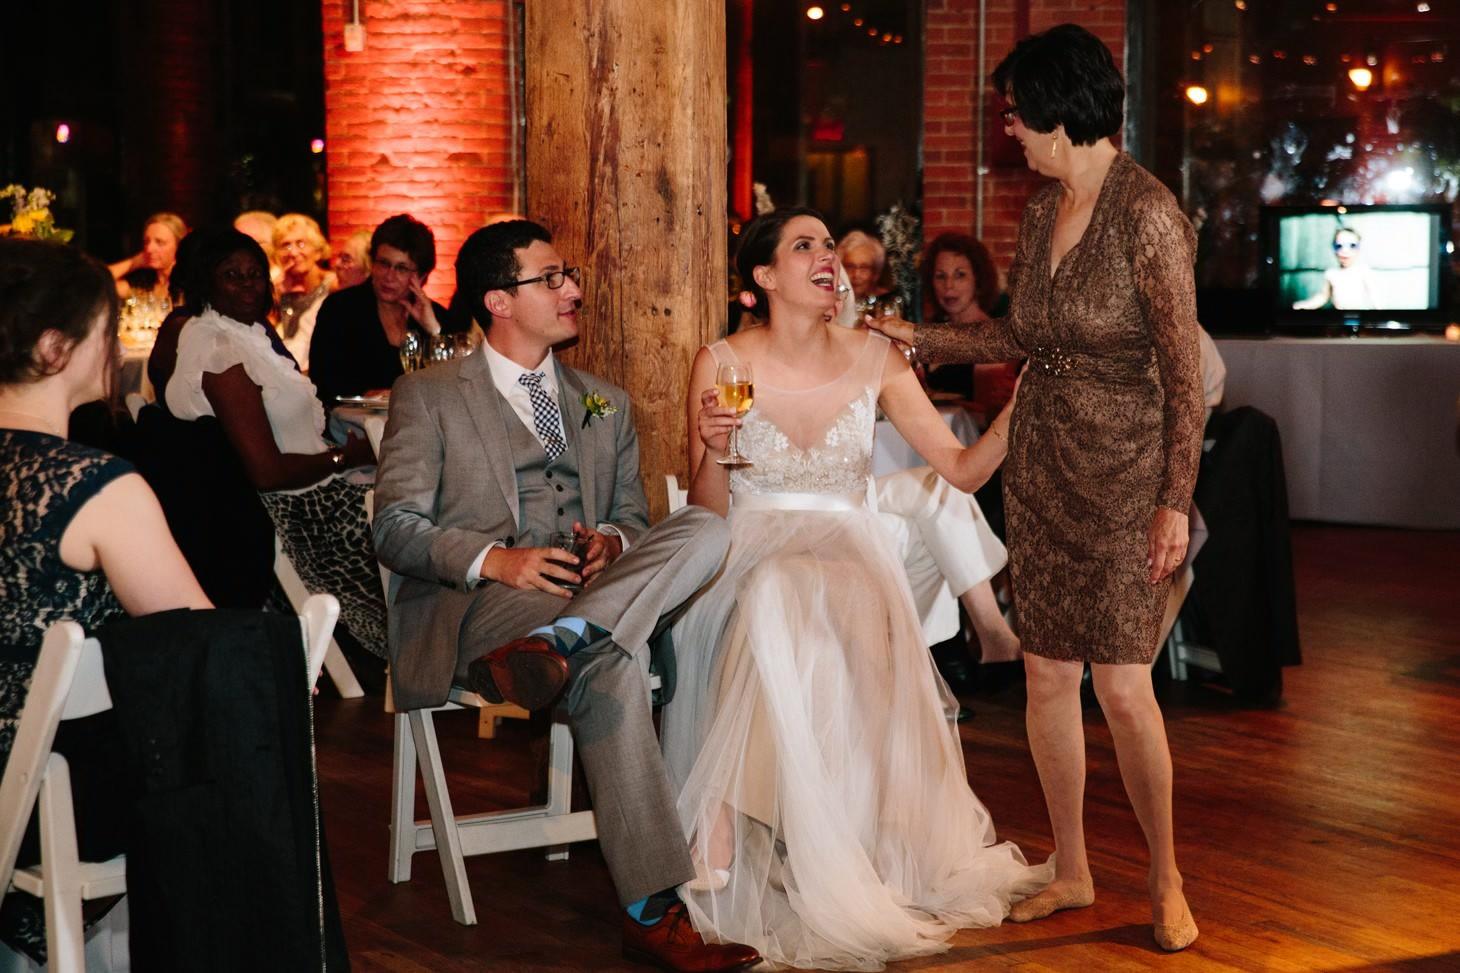 039-nyc-dumbo-loft-brooklyn-wedding-photographer-smitten-chickens-photo-.jpg